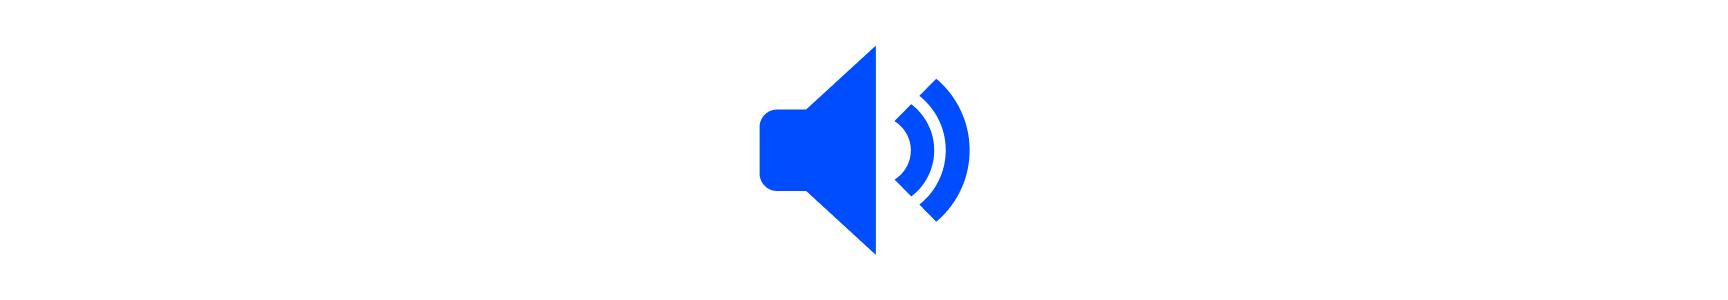 Audio icon projecting noise